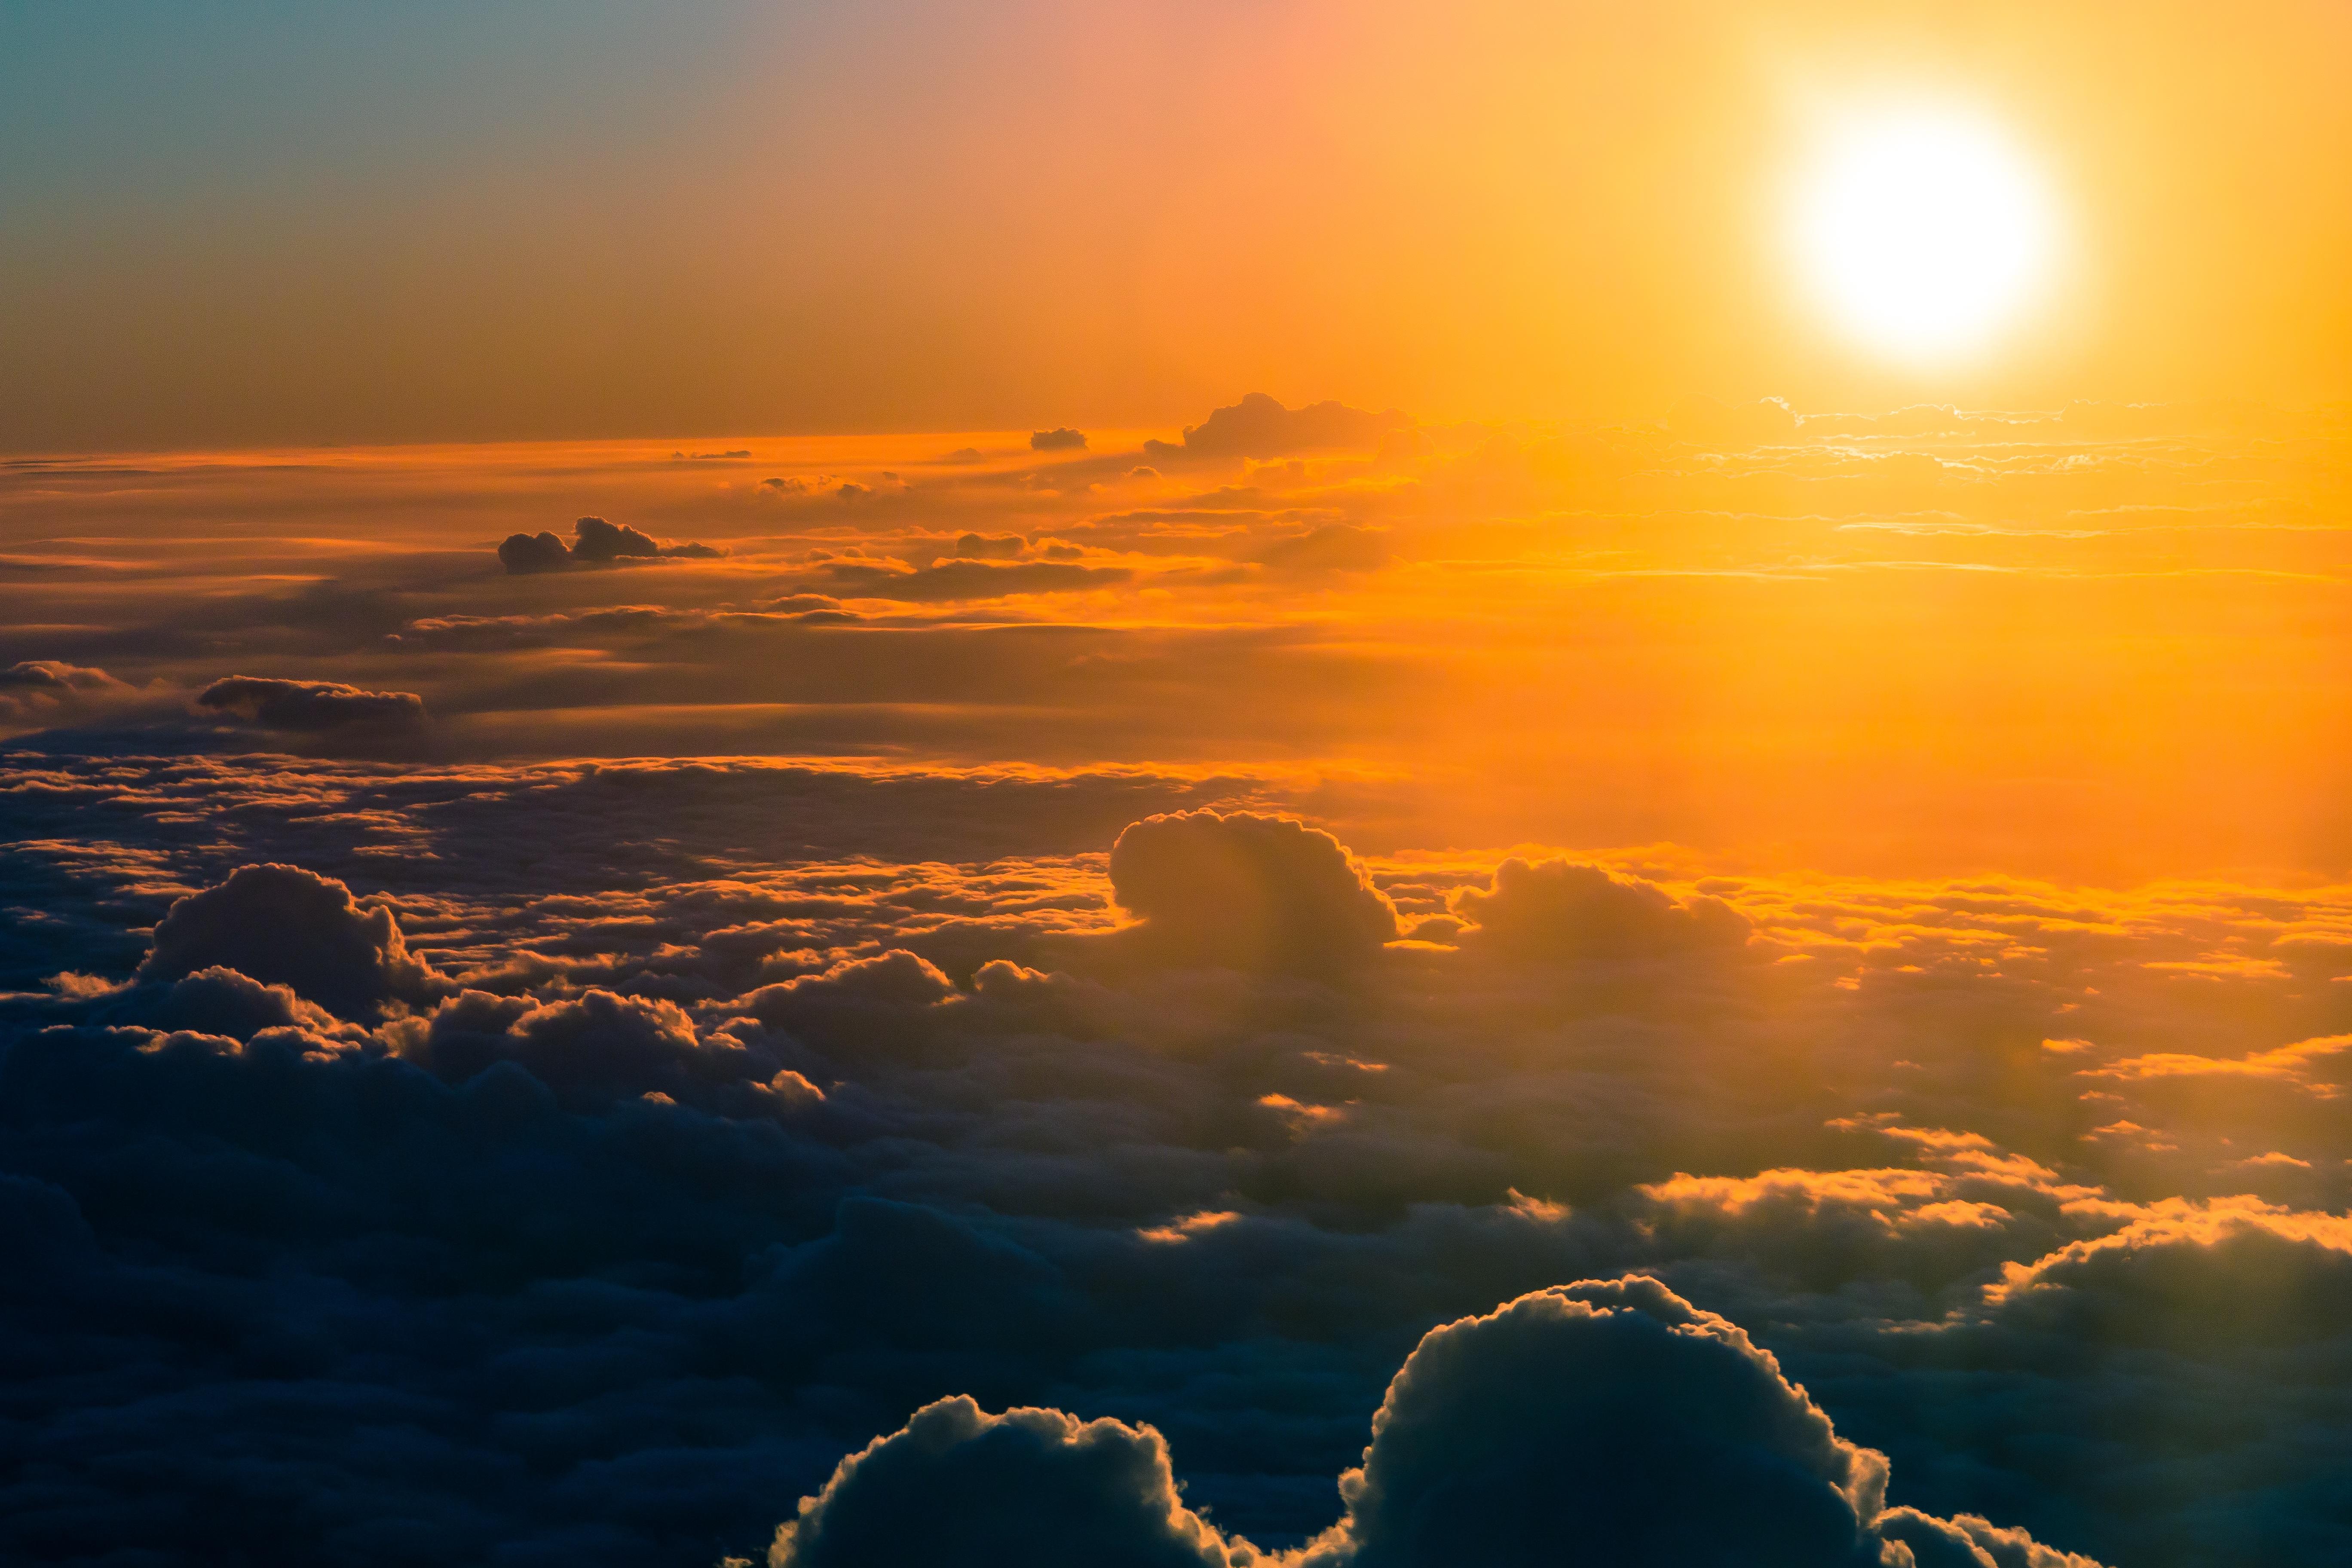 Best Iphone 4 Hd Wallpapers 1000 Interesting Sun Photos 183 Pexels 183 Free Stock Photos